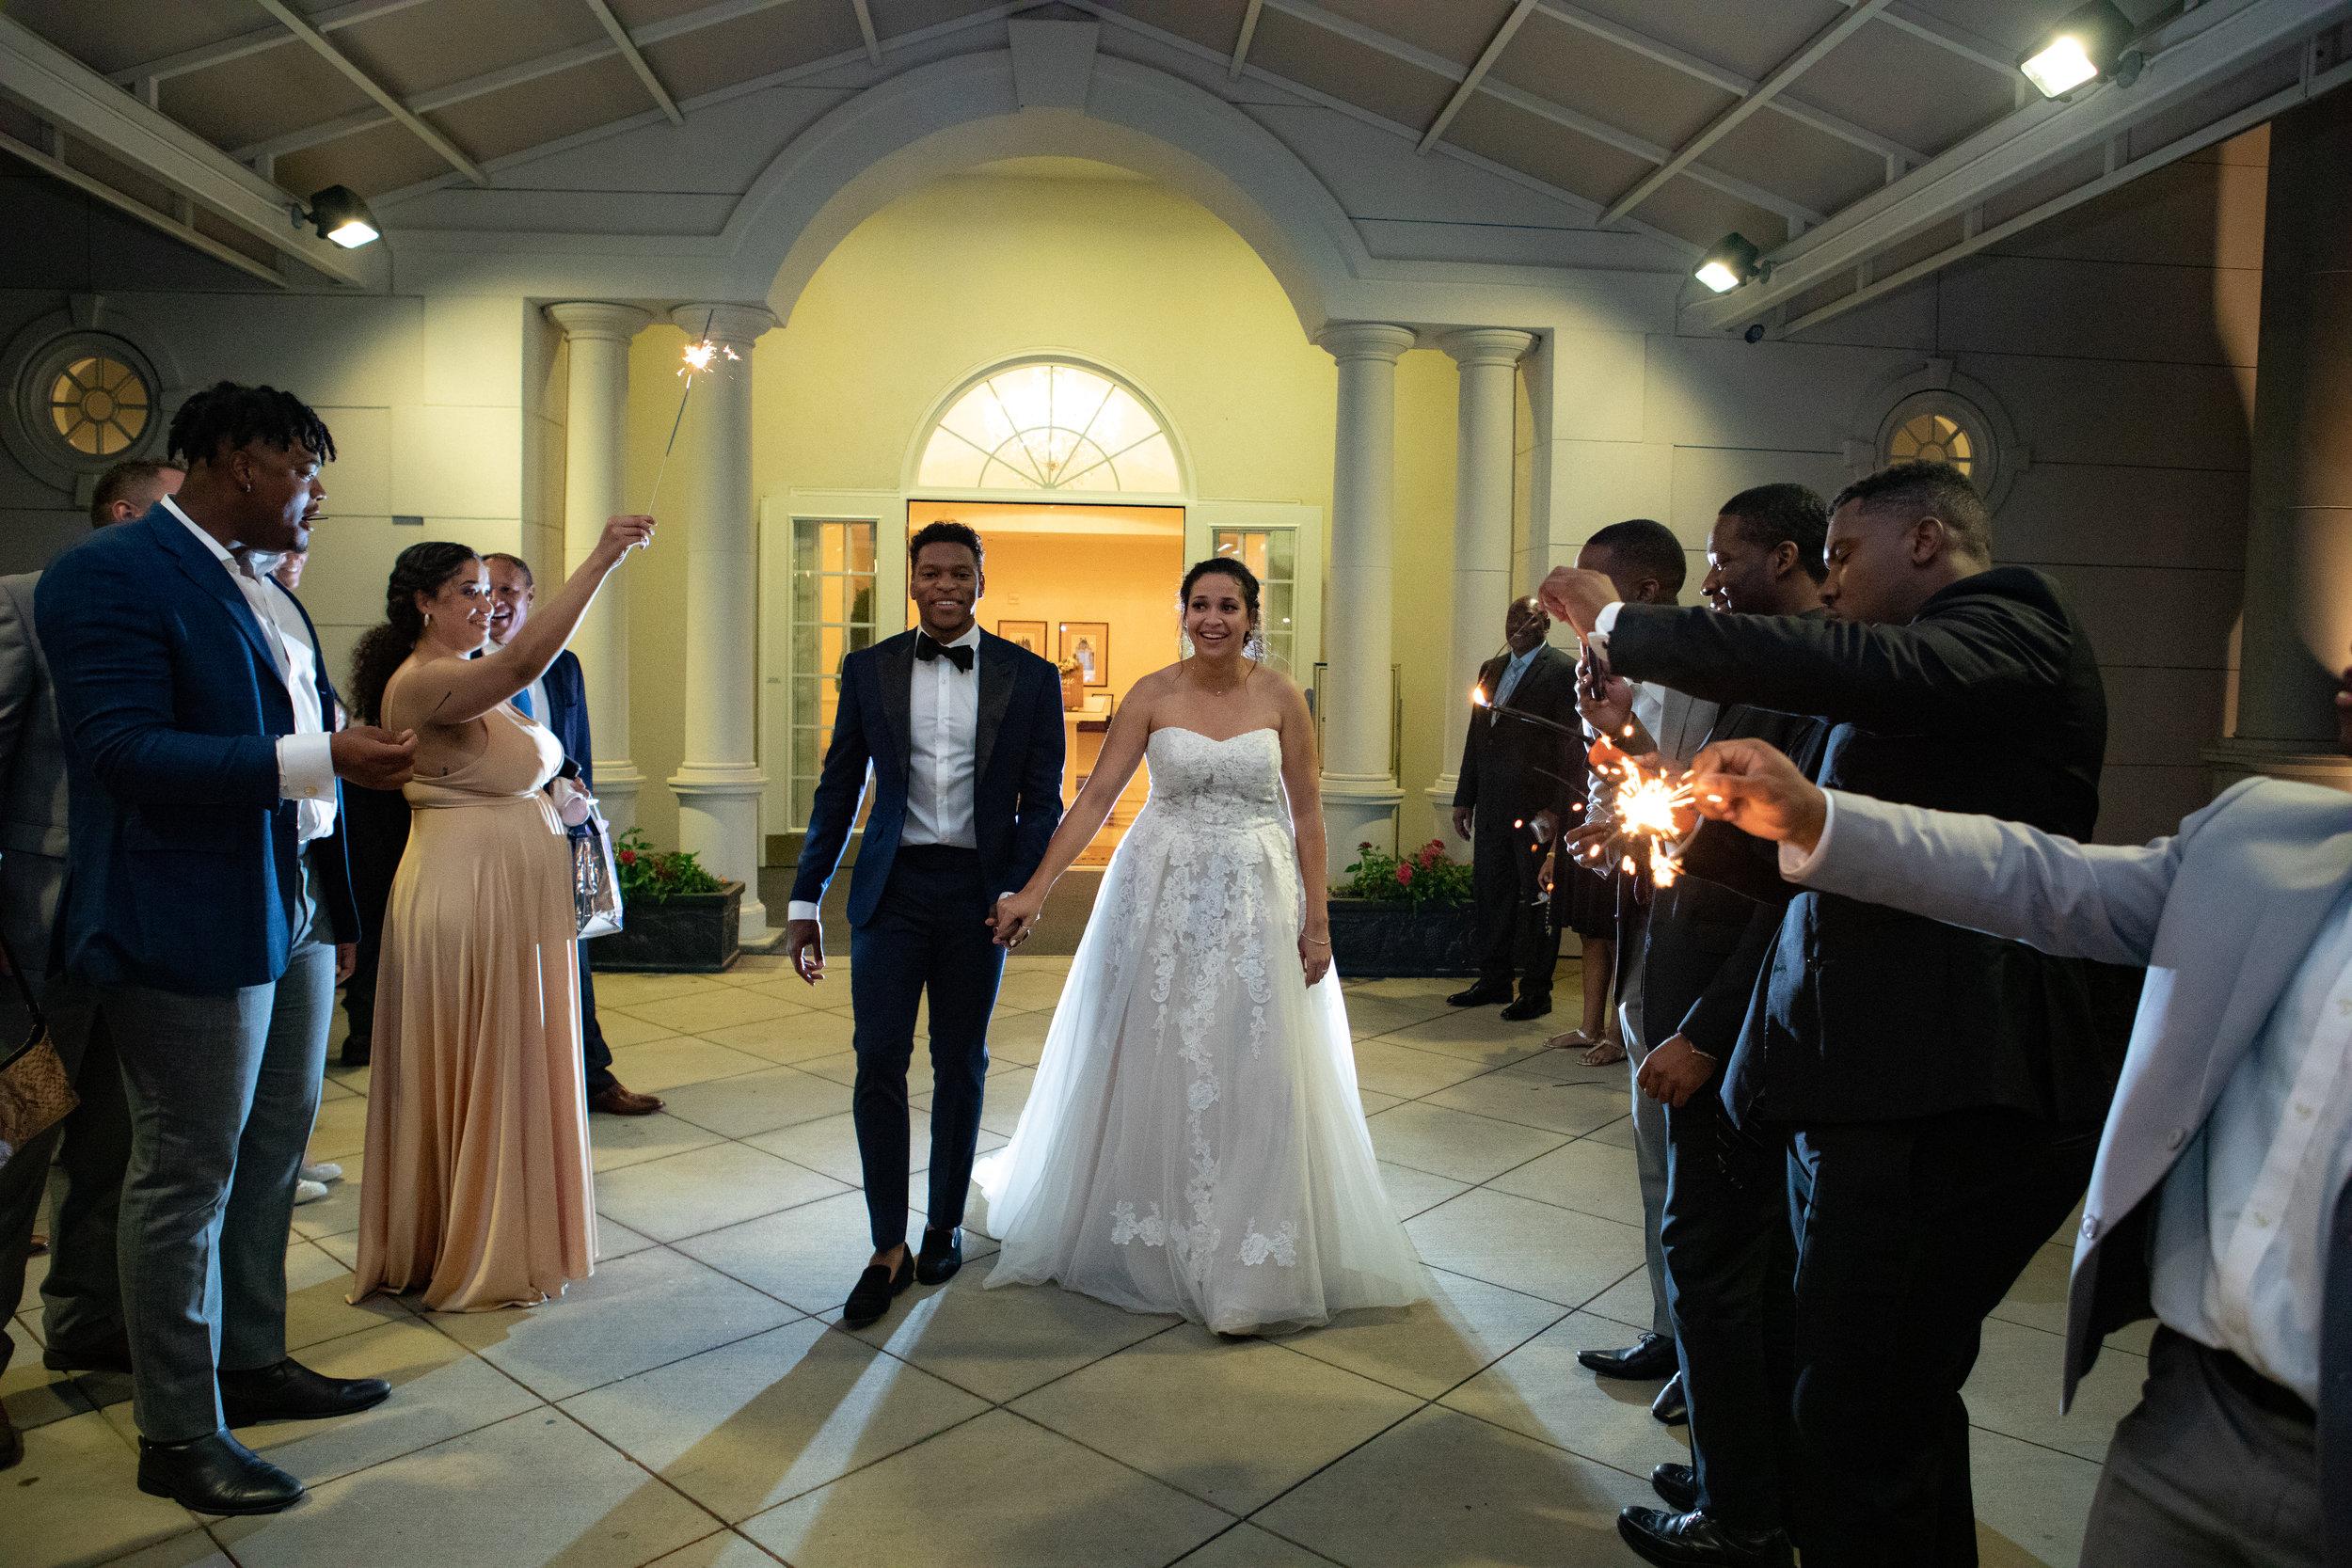 Sparkler exit photo by the Atlanta wedding photographers at AtlantaArtisticWeddings